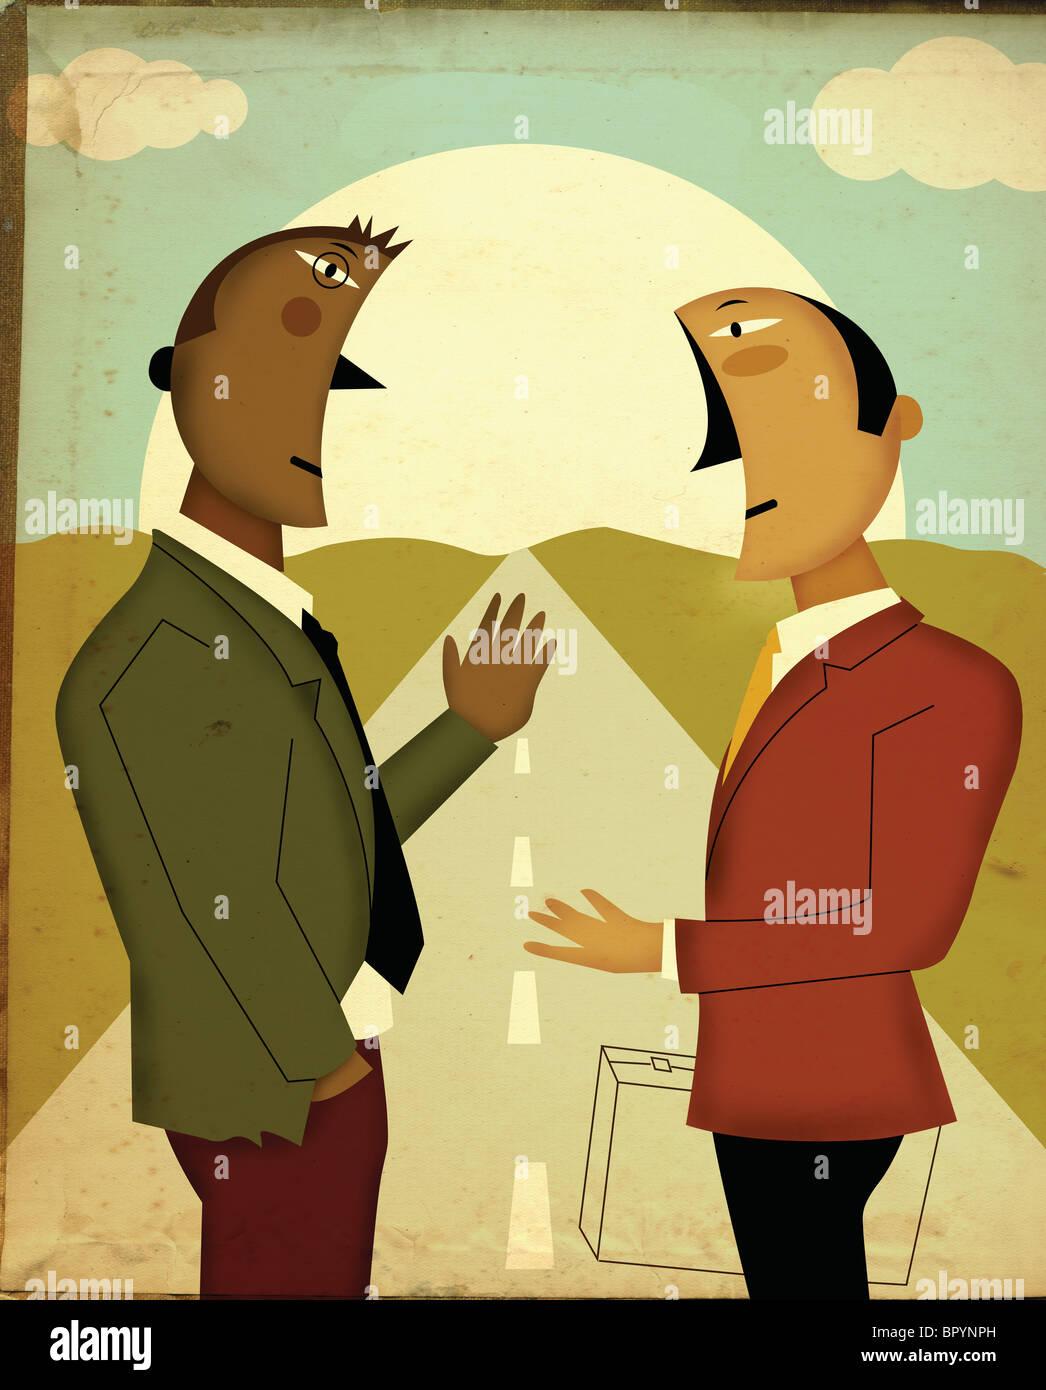 Cartoon Of Two Men Talking Stock Photos & Cartoon Of Two Men Talking Stock Images - Alamy